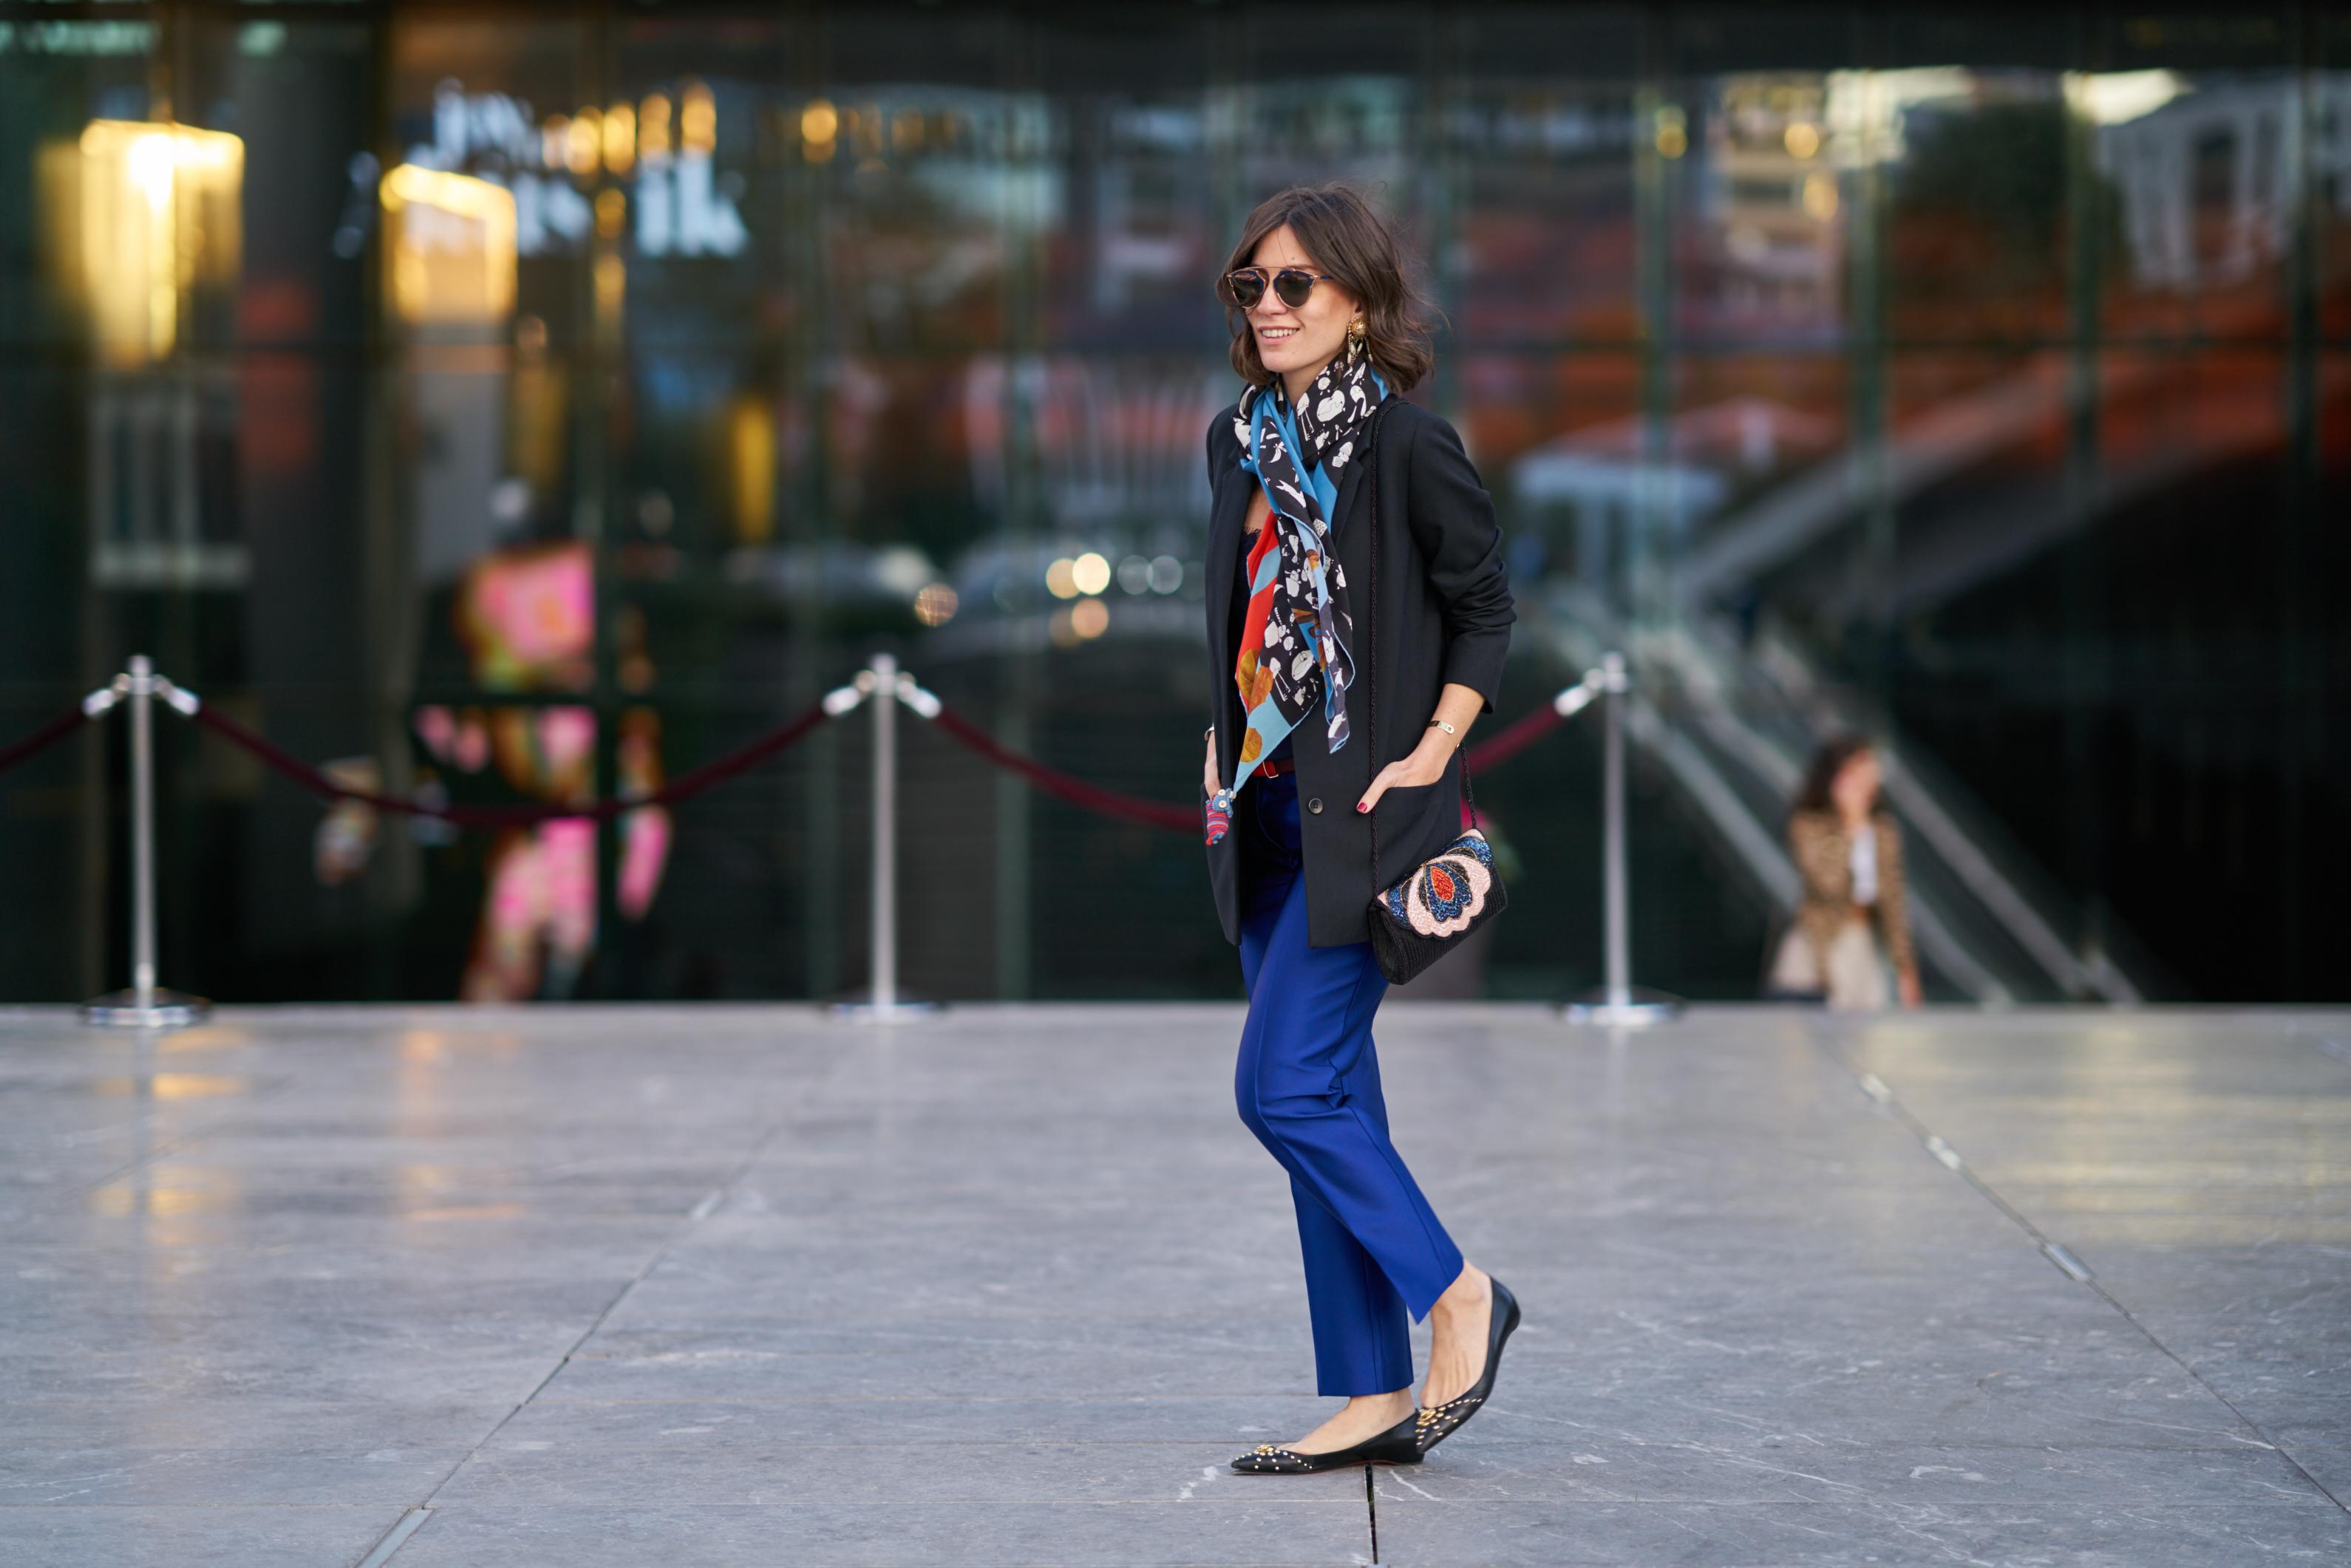 billur saatci, offnegiysem, street style, turkish style blogger, mbfwi, mercedes-benz fashion week istanbul, istanbul moda haftası, ne giydim, ootd, fey, massimo dutti, vintage, dior, rumisu, christian louboutin, vintage istanbul